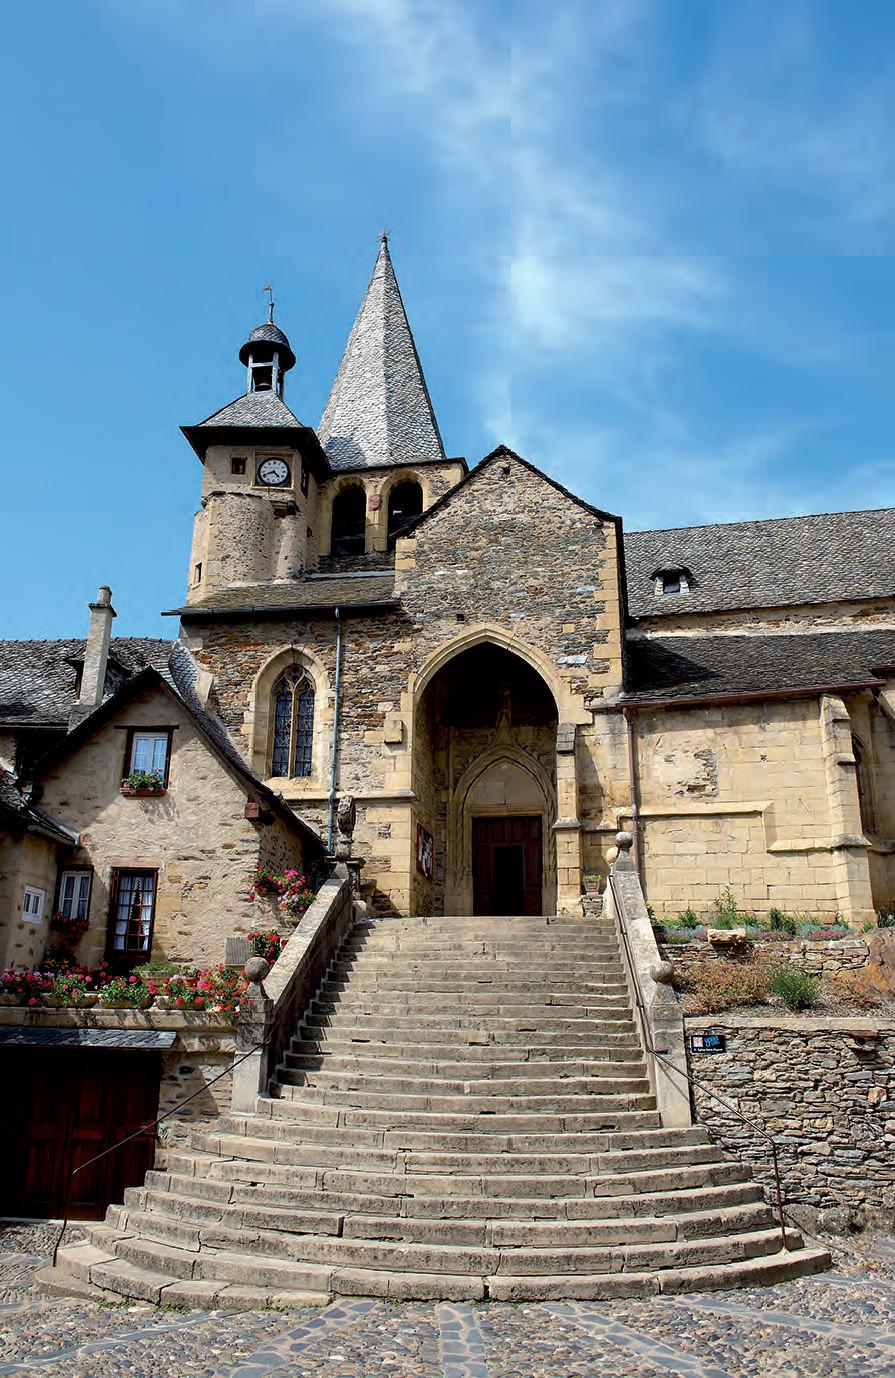 http://www.st-jacques-aveyron.com/ititour/objects/media/photo/images/pdv11_j19_grand-patrimoine-religieux_1.jpg